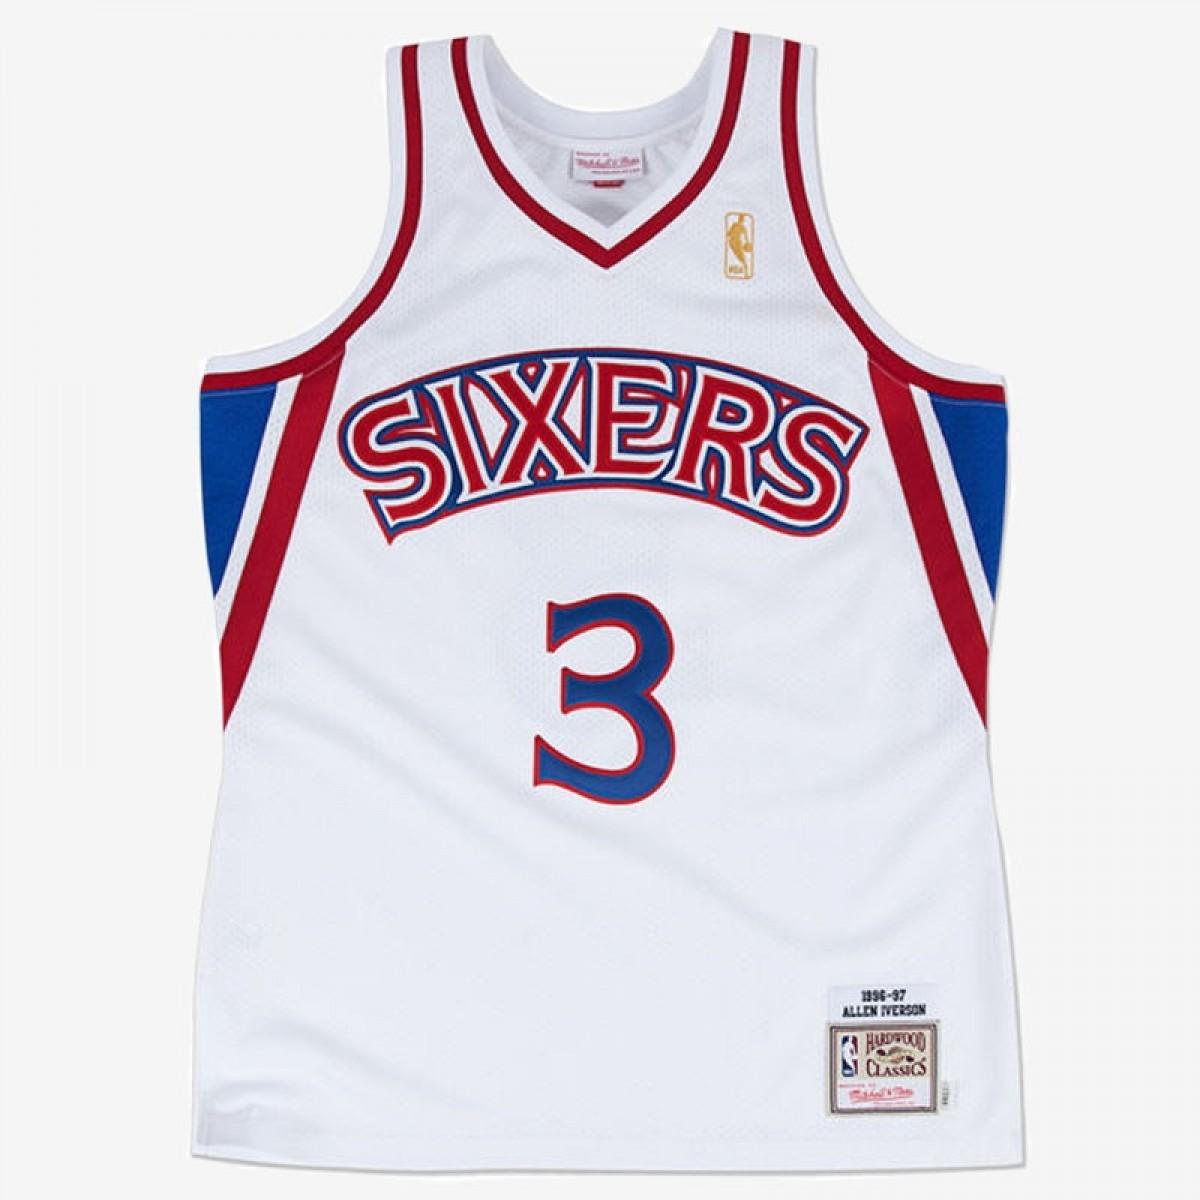 Mitchell & Ness Iverson Swingman Jersey Home 'Philadelphia 76ers'